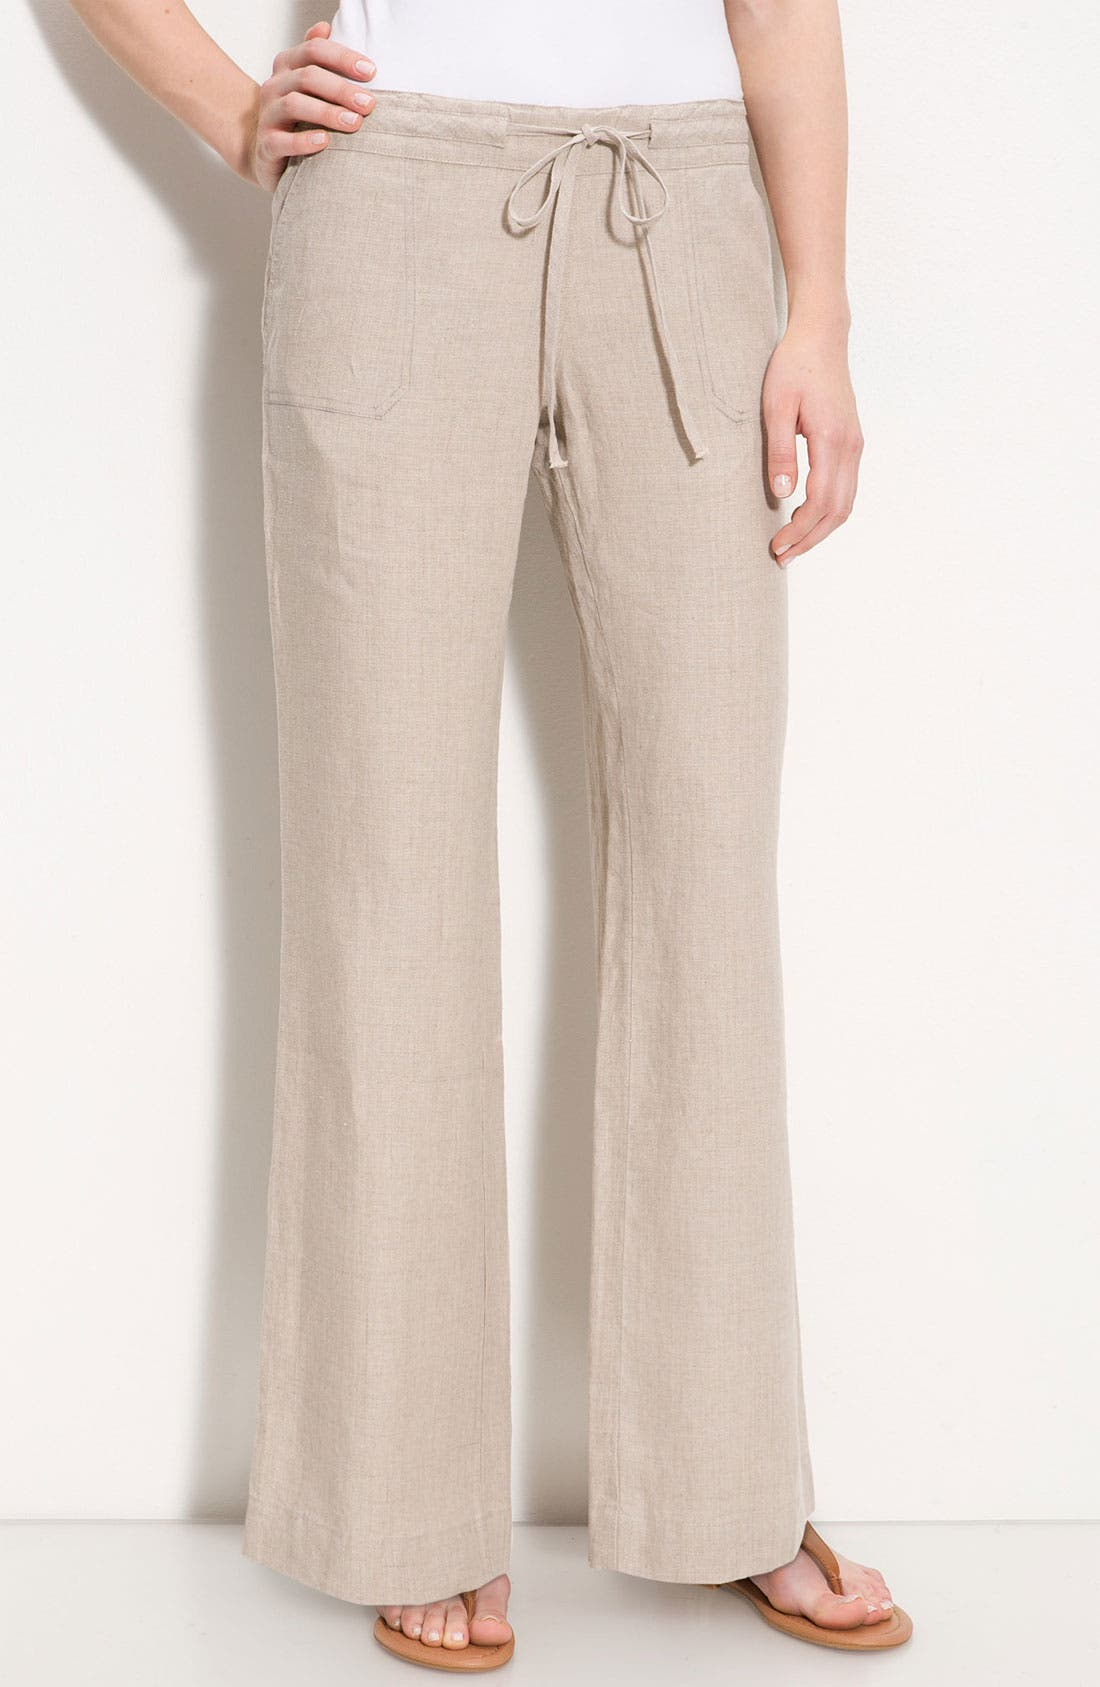 Alternate Image 1 Selected - Allen Allen Drawstring Linen Pants